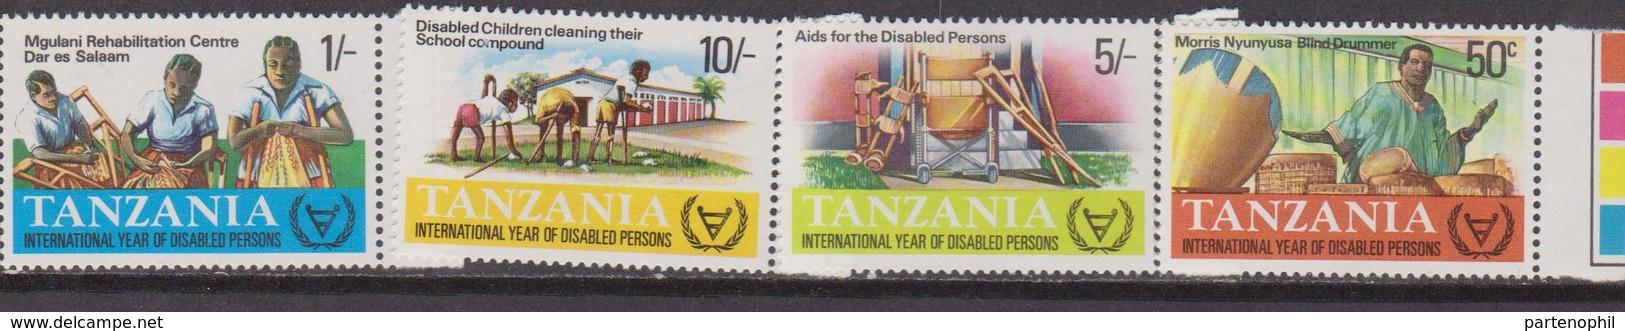 Tanzania 1981 Disabled Healt Medicine Set MNH - Handicap